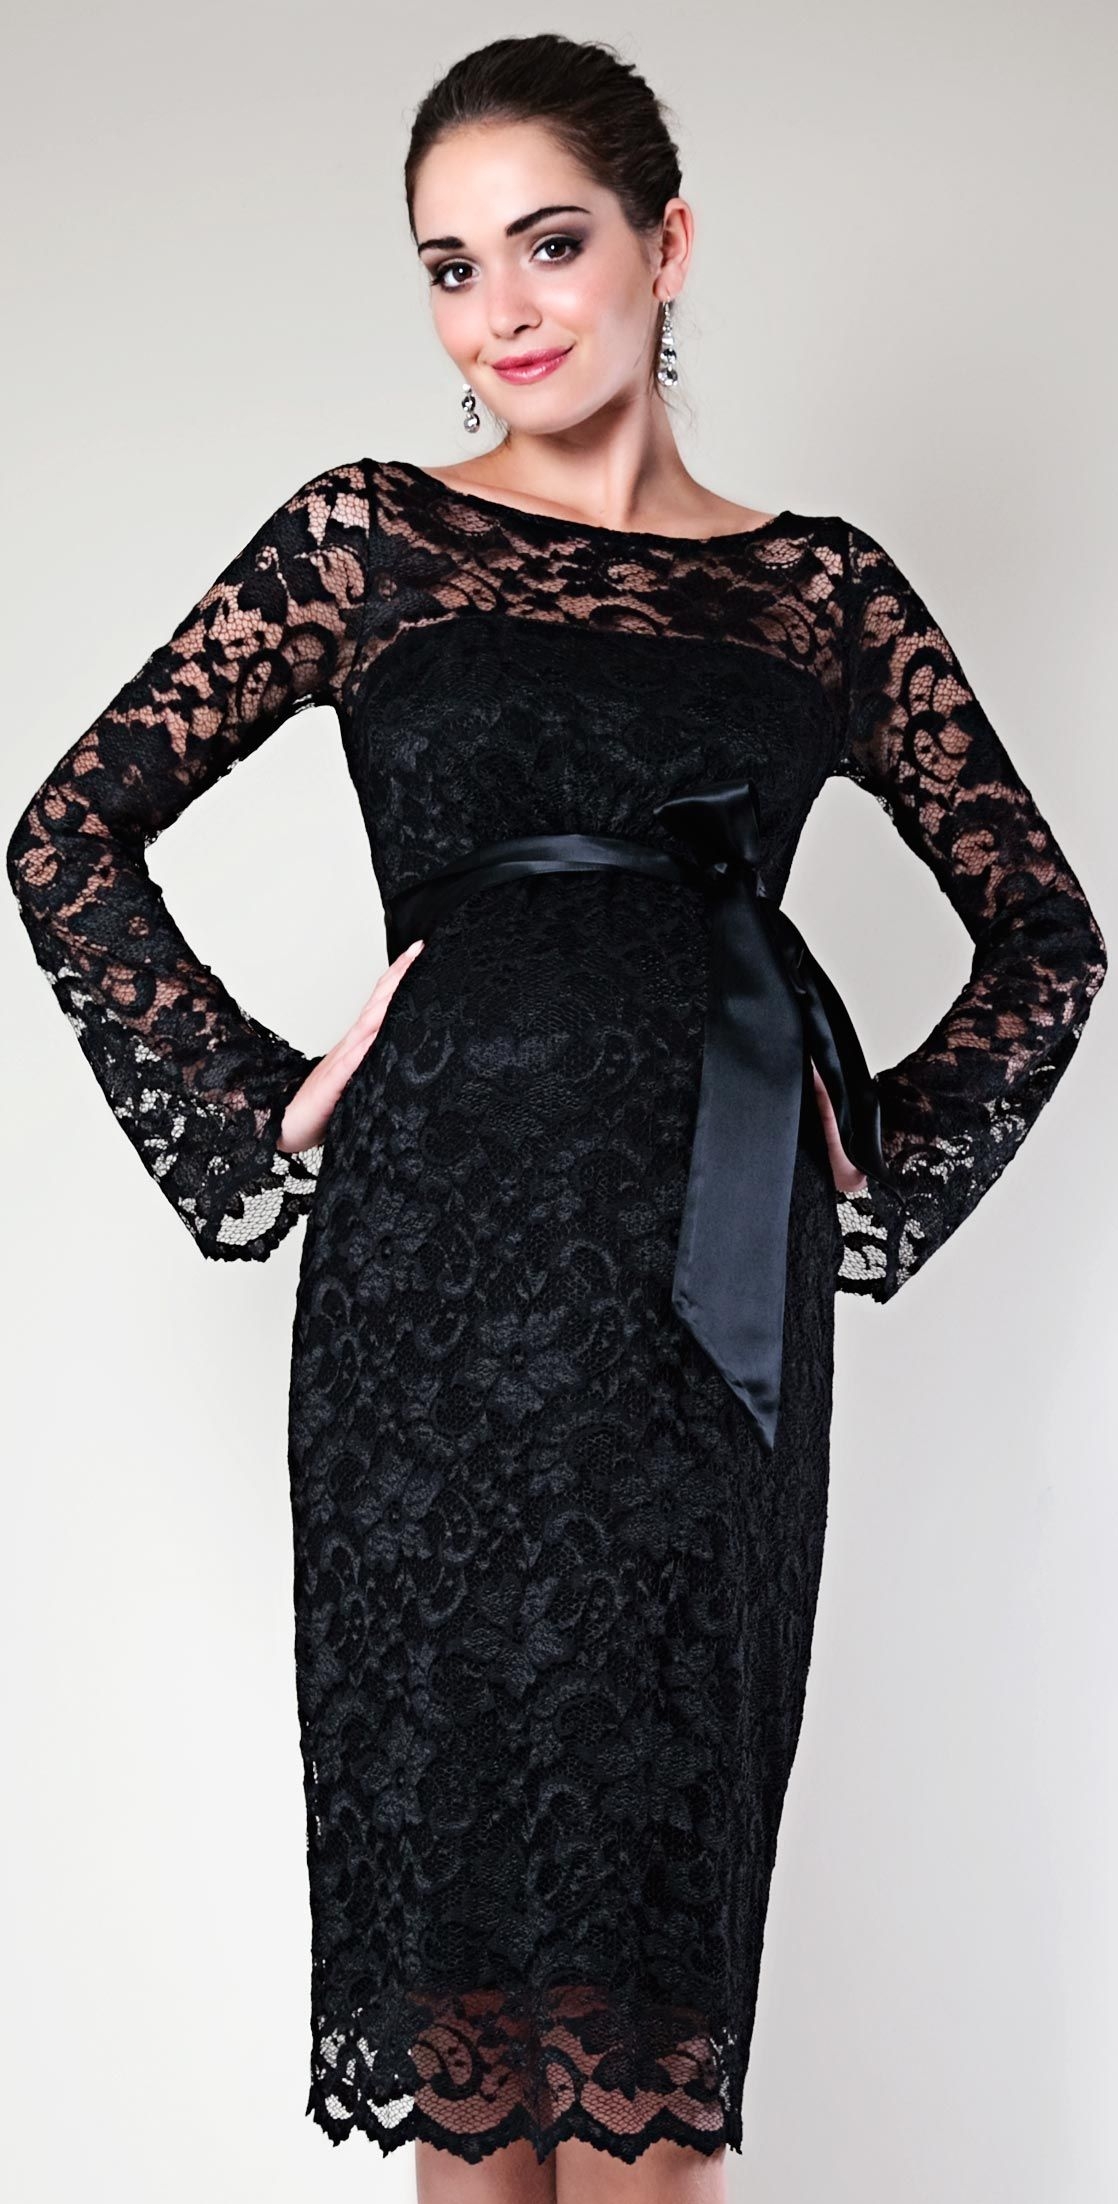 Chloe lace dress short tiffany rose party clothes and maternity chloe lace dress short ombrellifo Images